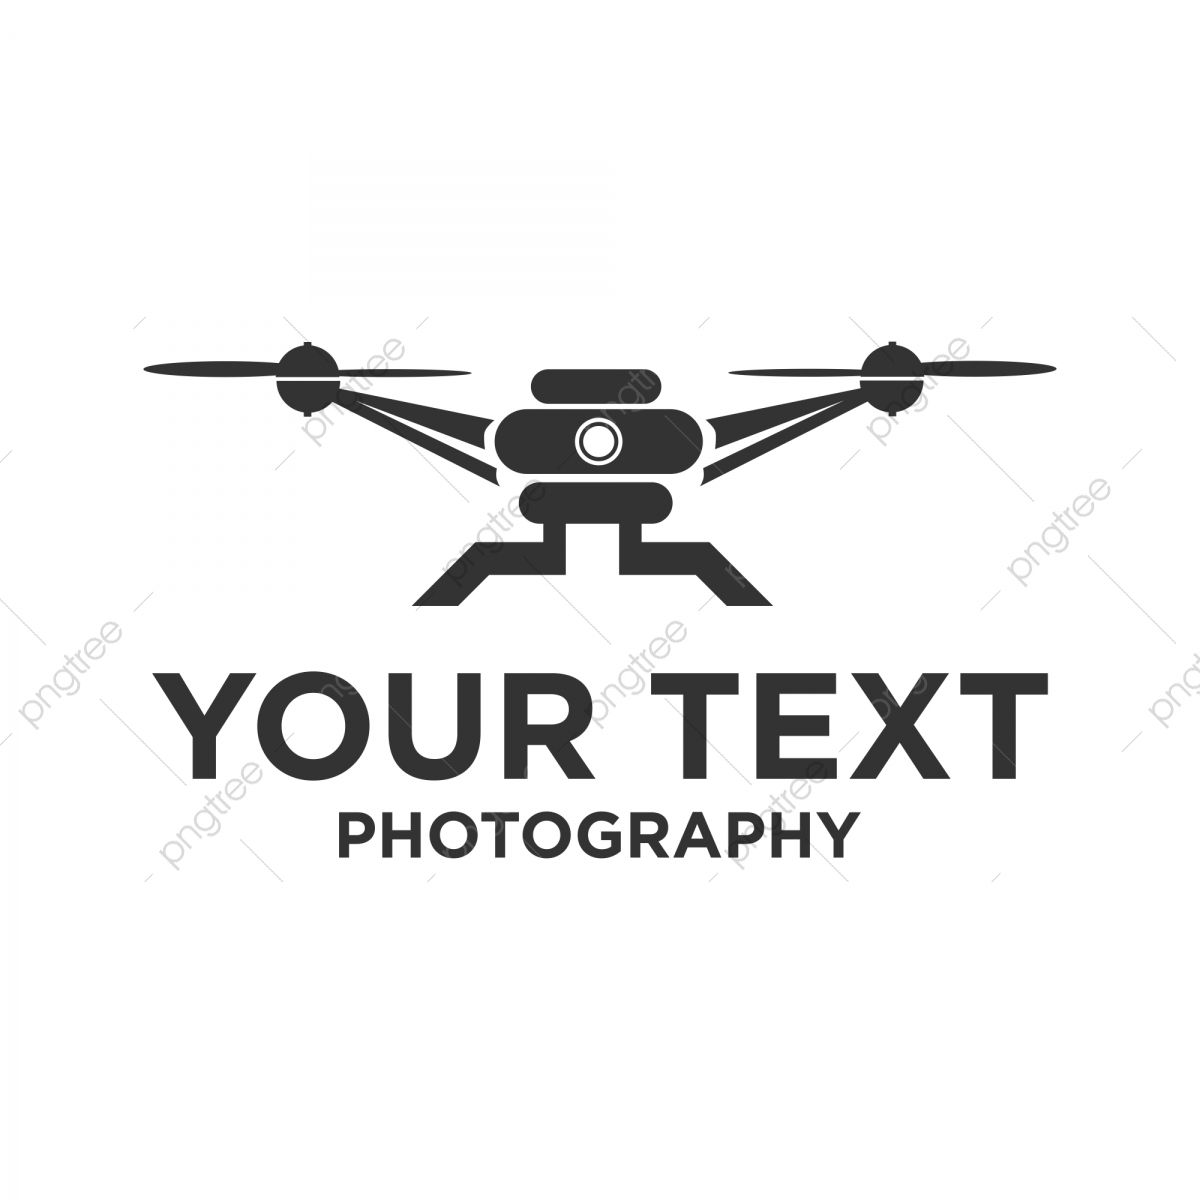 Drone Logo Design Ilustracao Vetorial Logo Icones Icones De Drone Imagem Png E Vetor Para Download Gratuito Drone Logo Logo Design Photography Logo Design